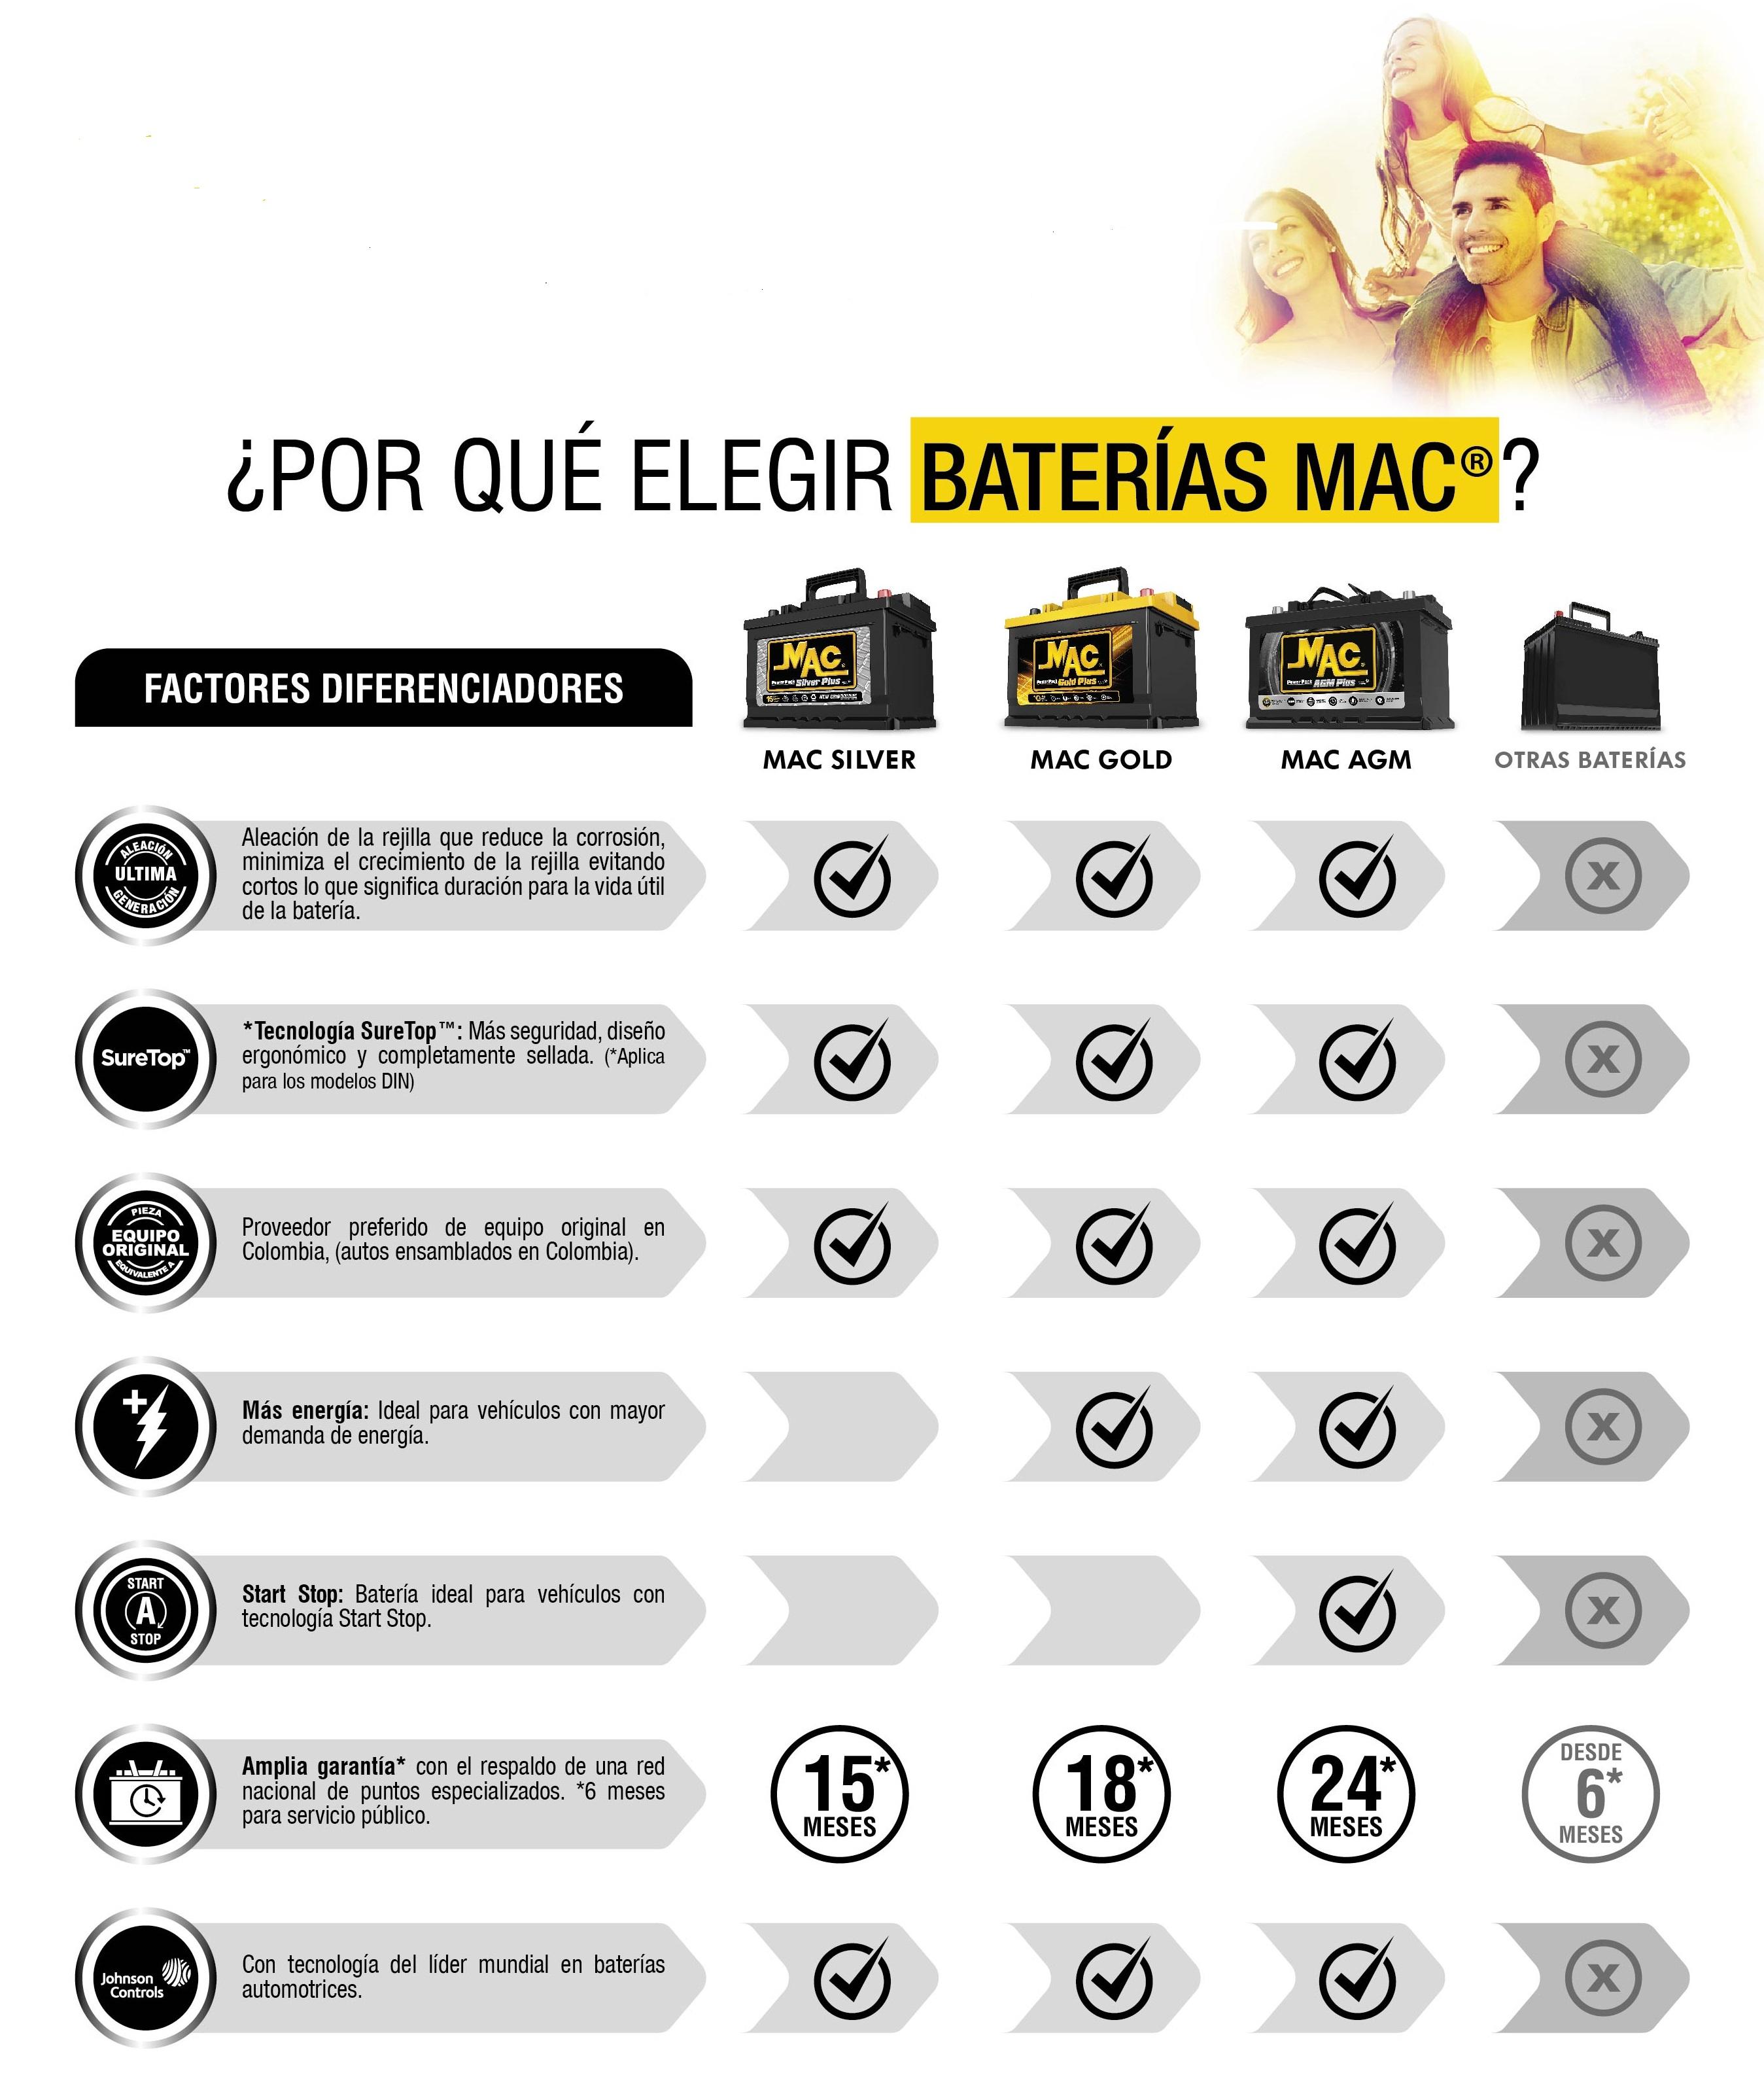 Por_Que_elegir_MAC_-_Spanish.jpg